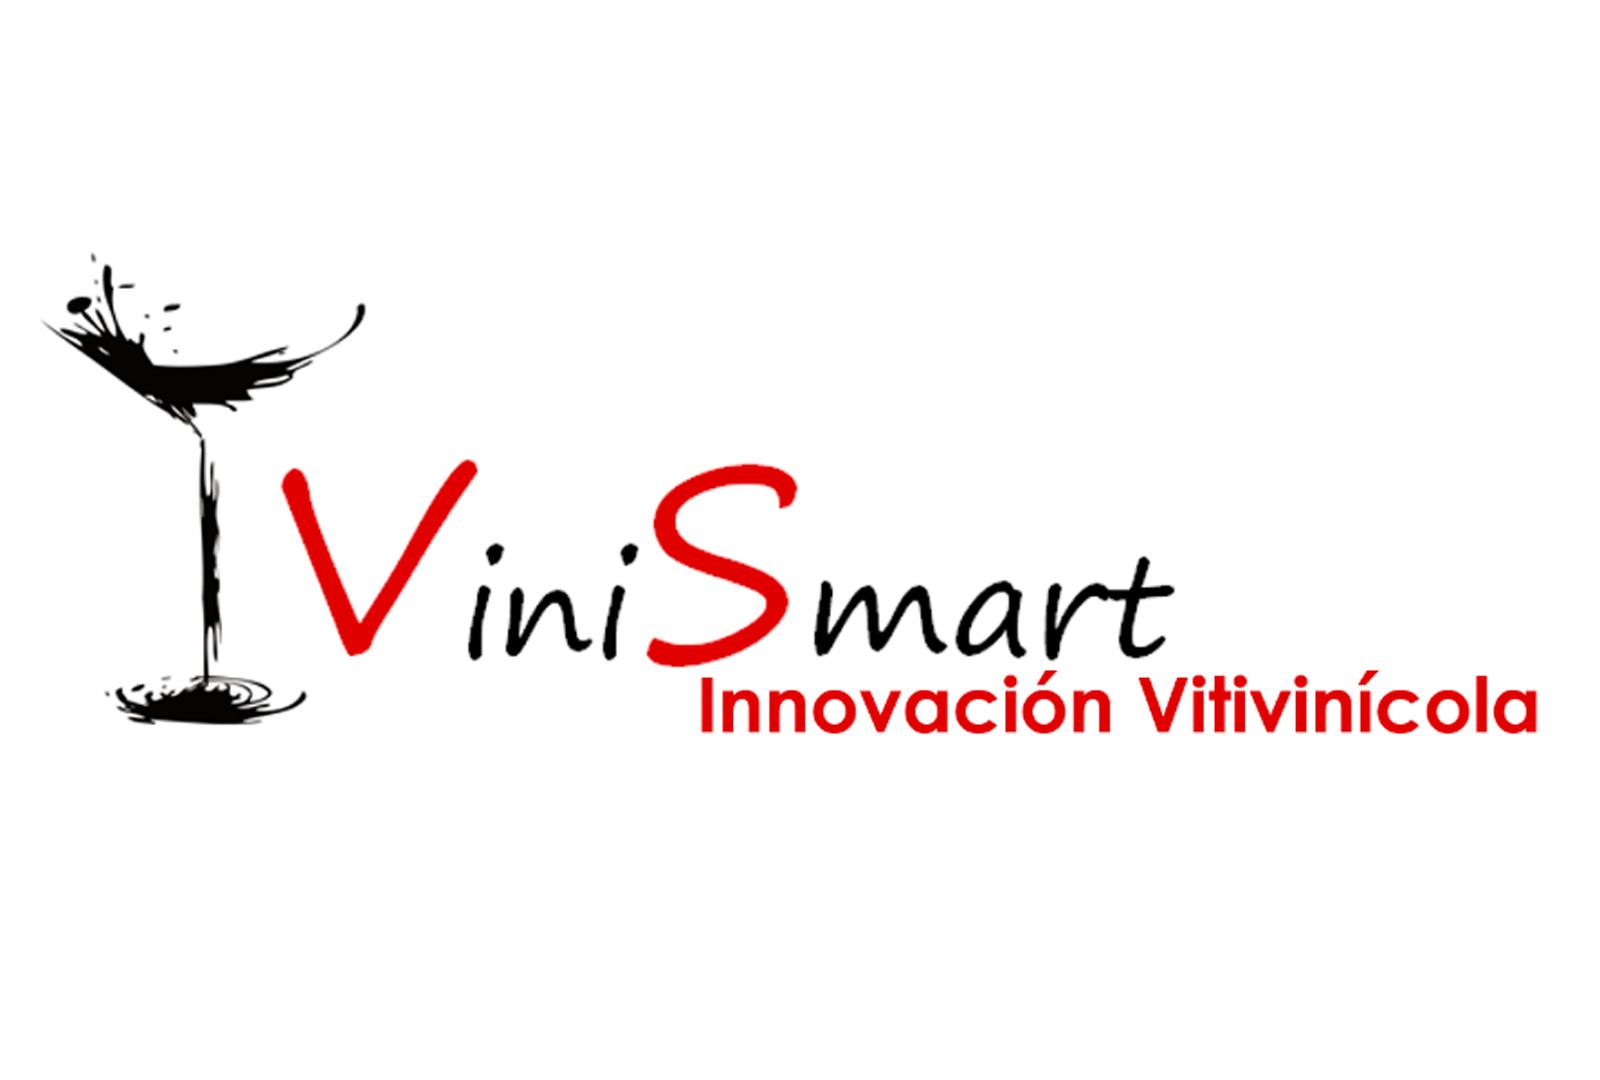 ViniSmart. Innovación del sector vitivinícola.